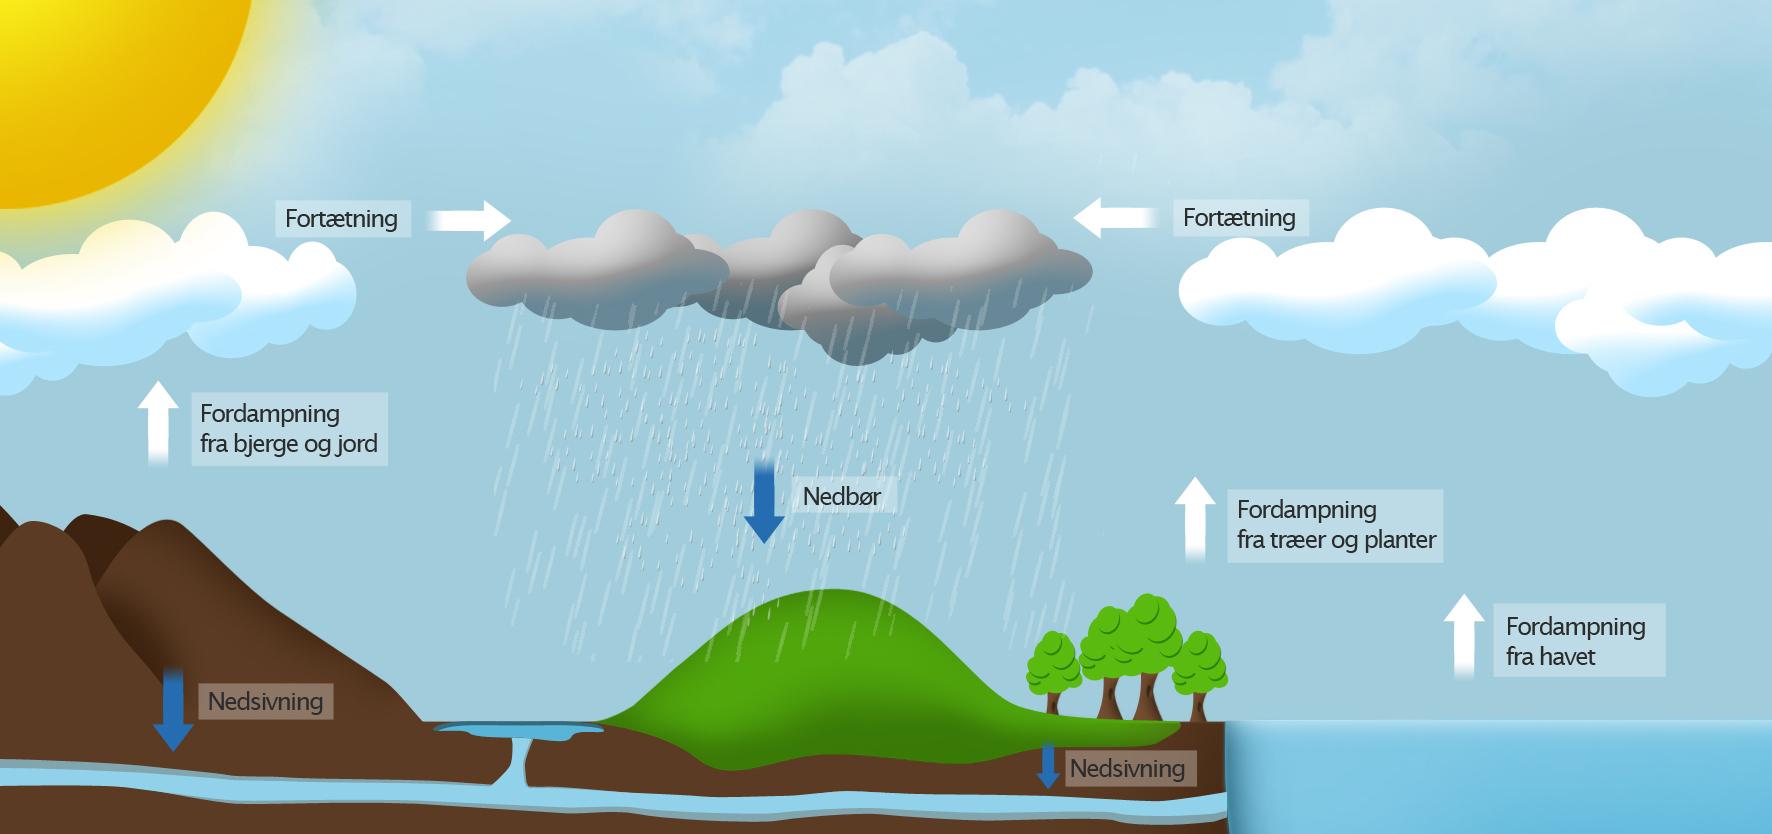 hvordan opstår skyer